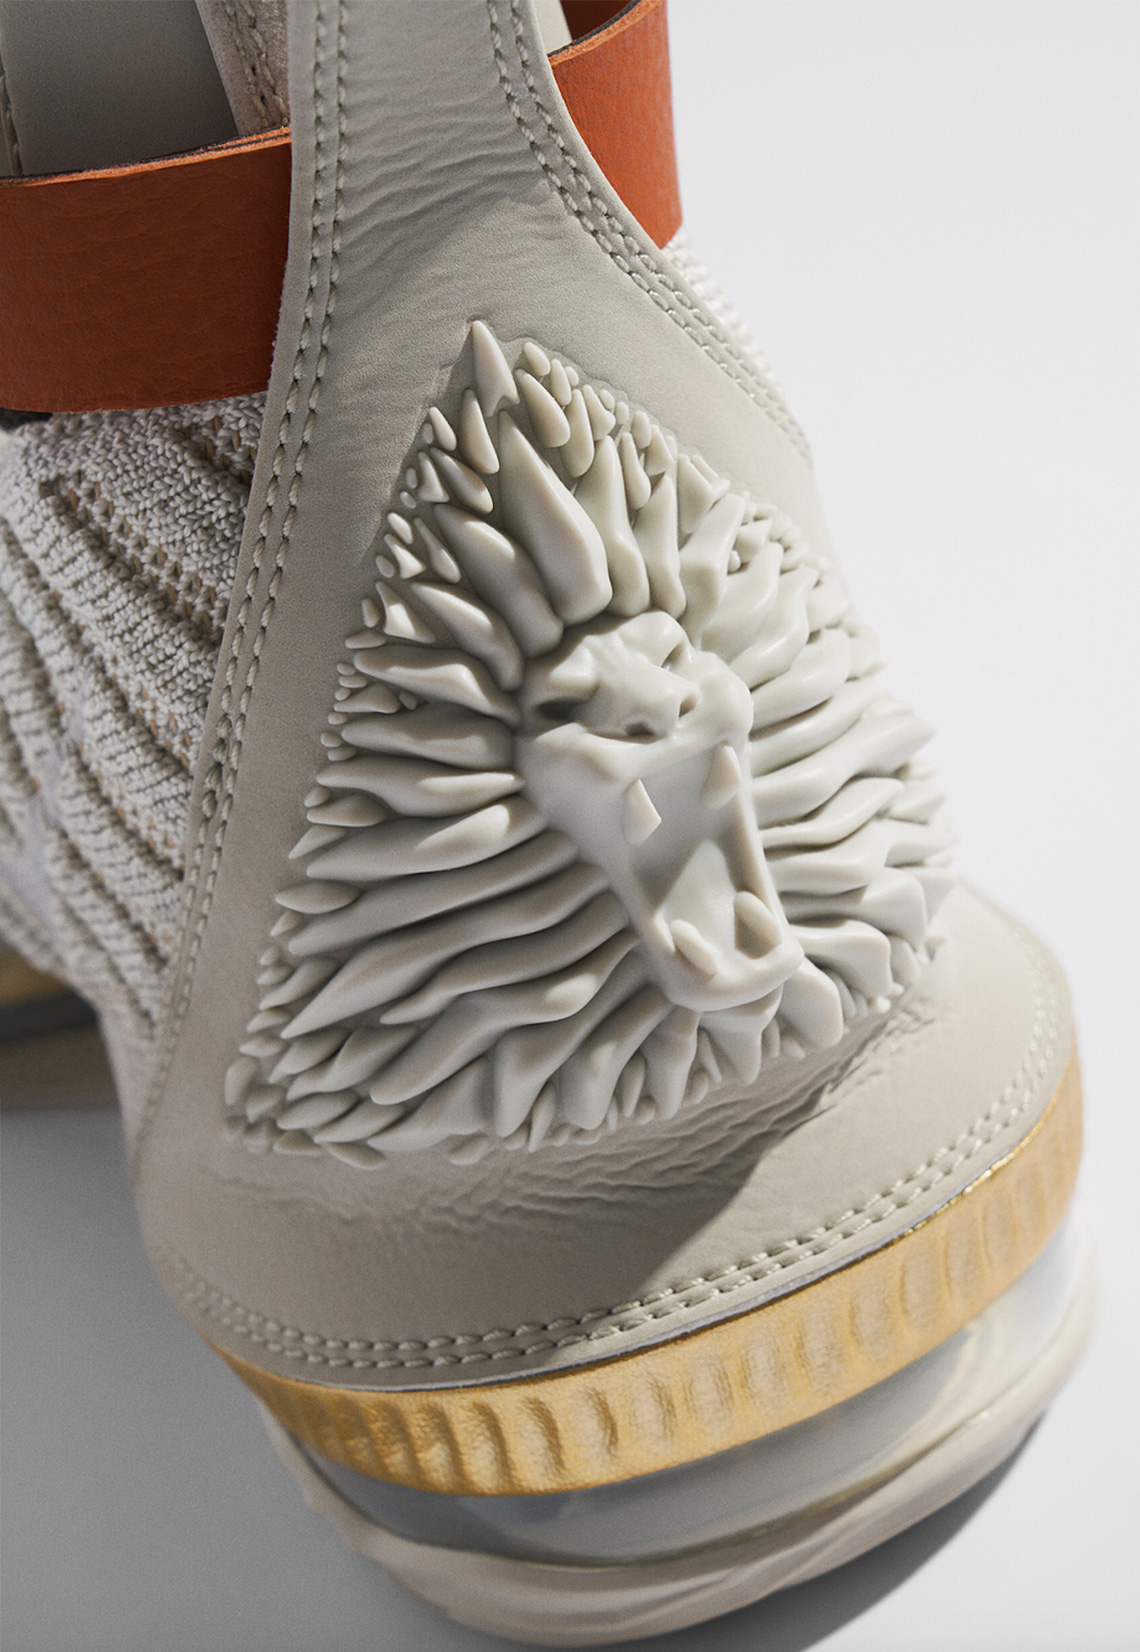 731dead657c Nike LeBron 16 HFR Harlem s Fashion Row Release Date